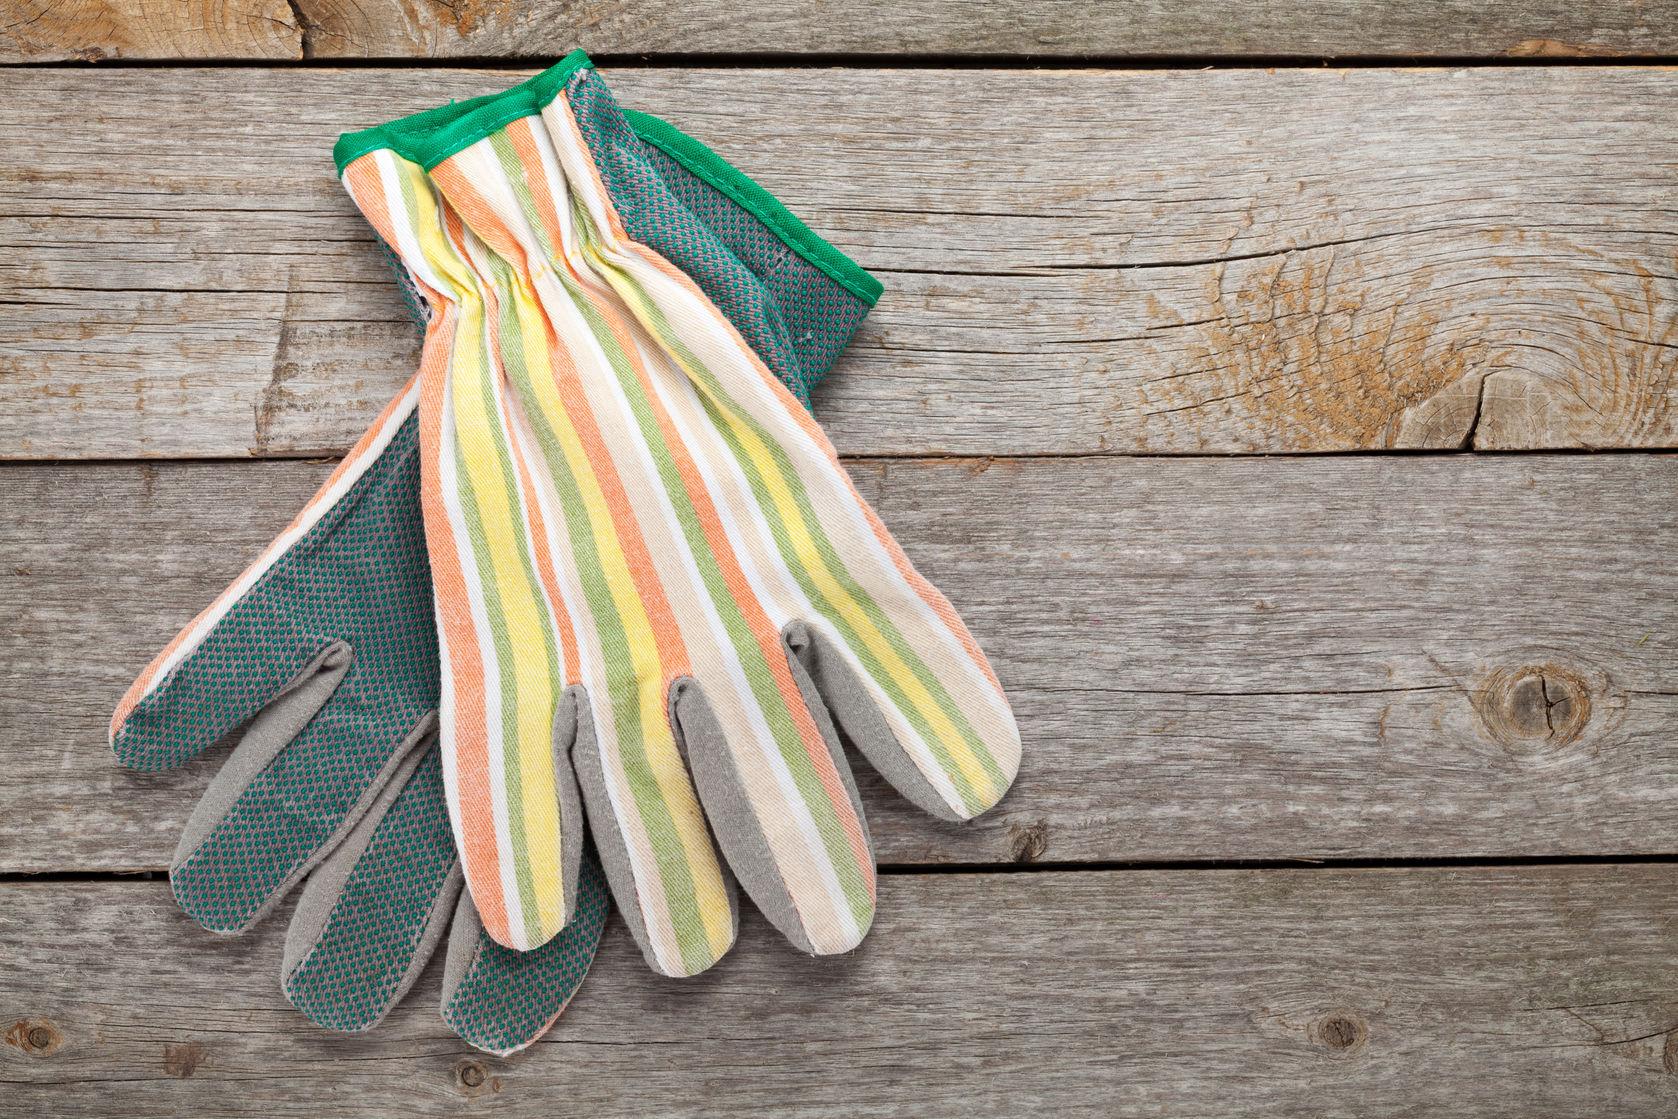 gloves garden tools